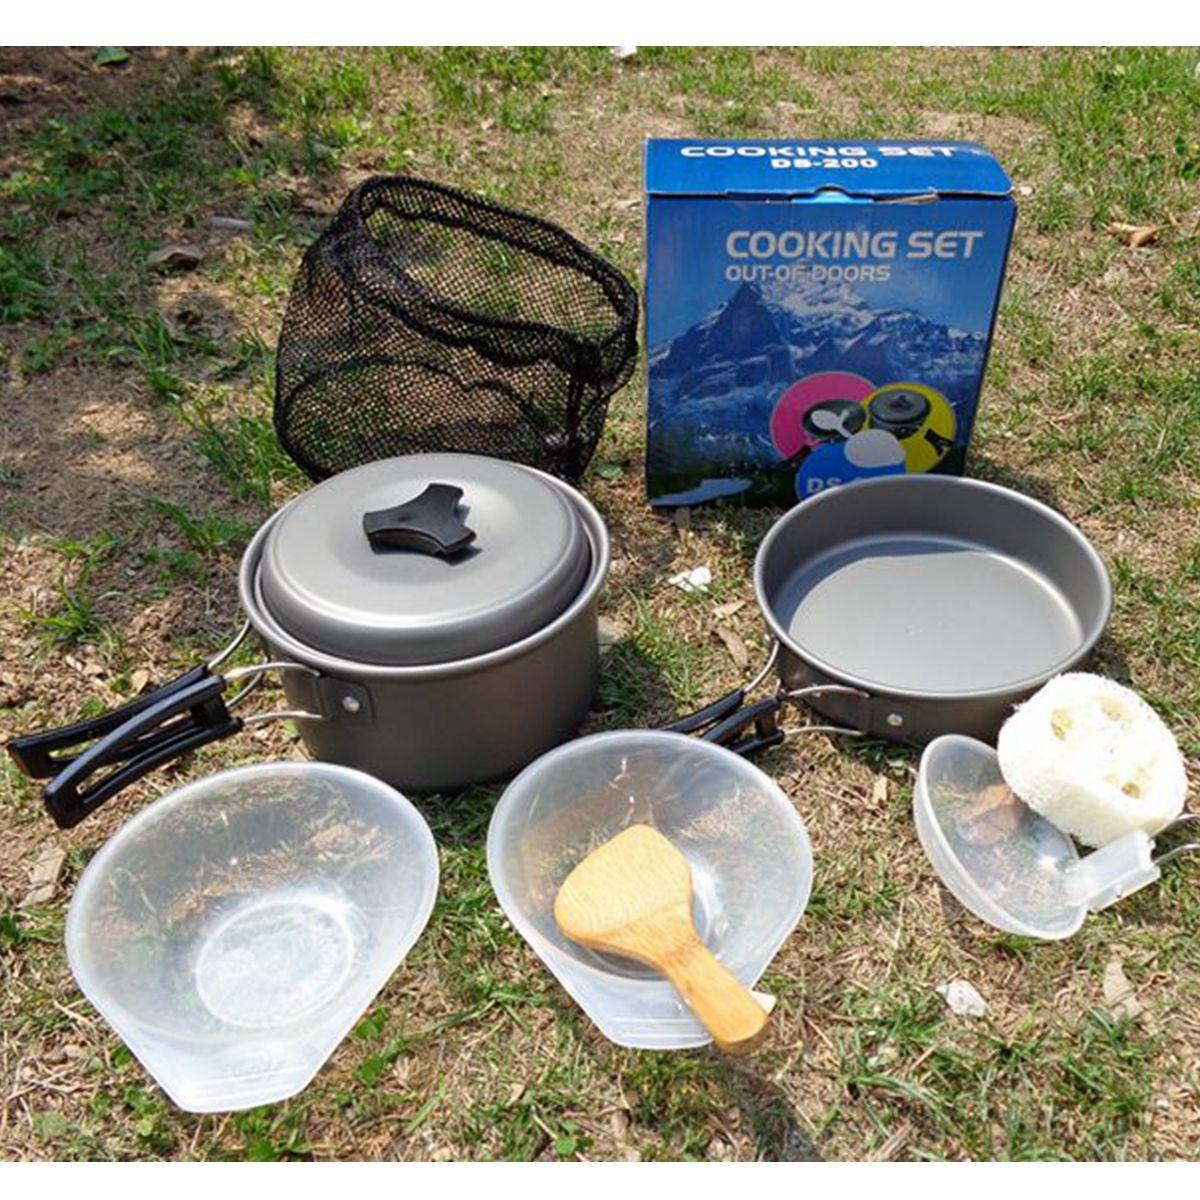 Portable Outdoor Camping Hiking Picnic Cookware Bowl Pot Pan Fork Stove Sets